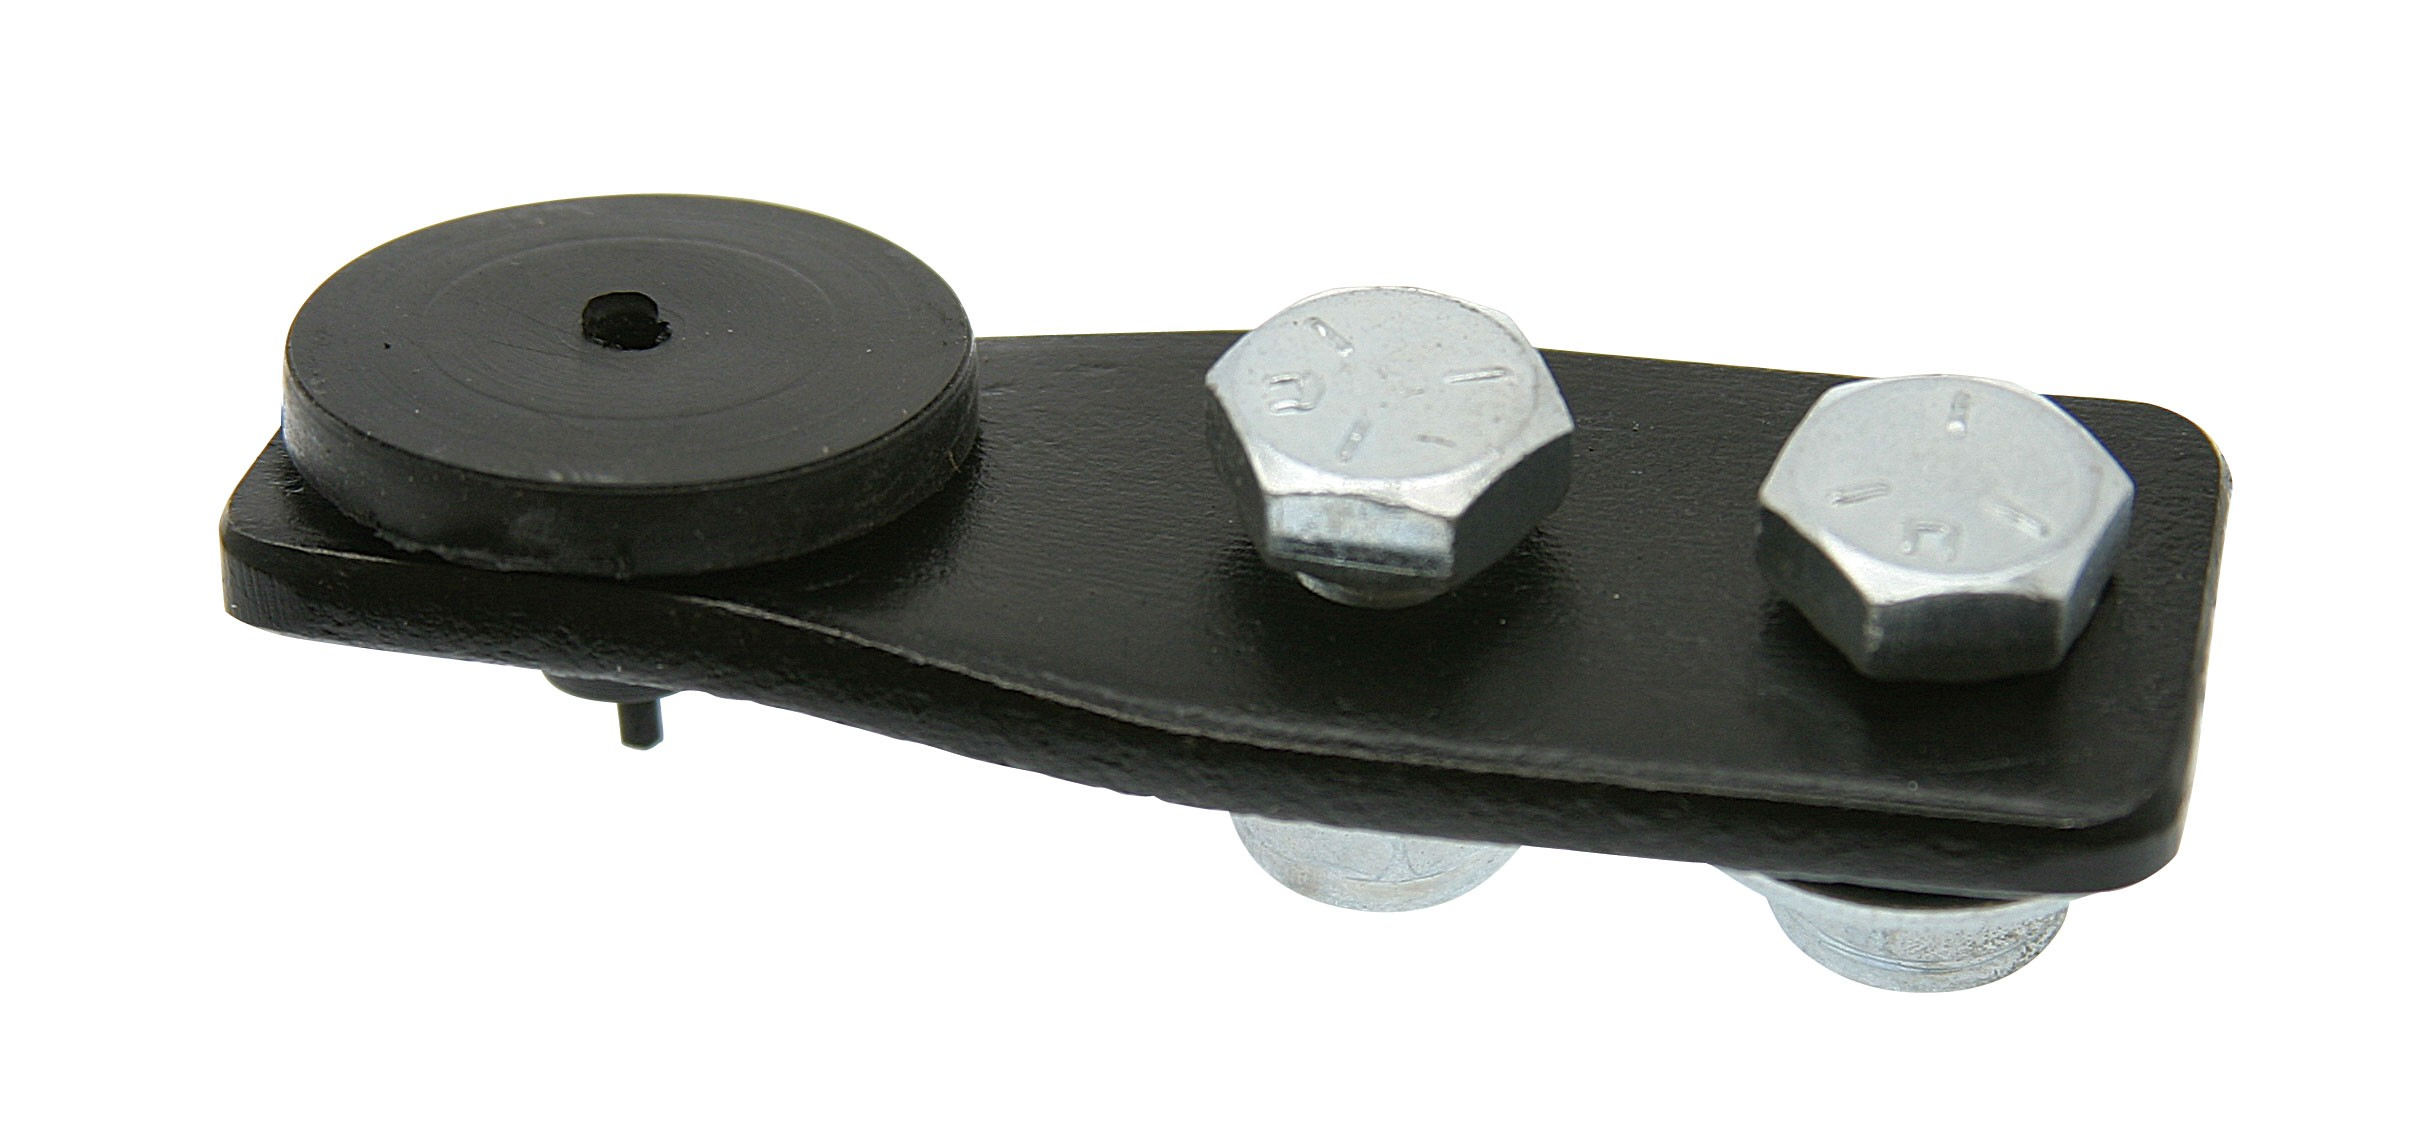 78-87 CLUTCH LINKAGE 78-87, Pedal Stop Kit